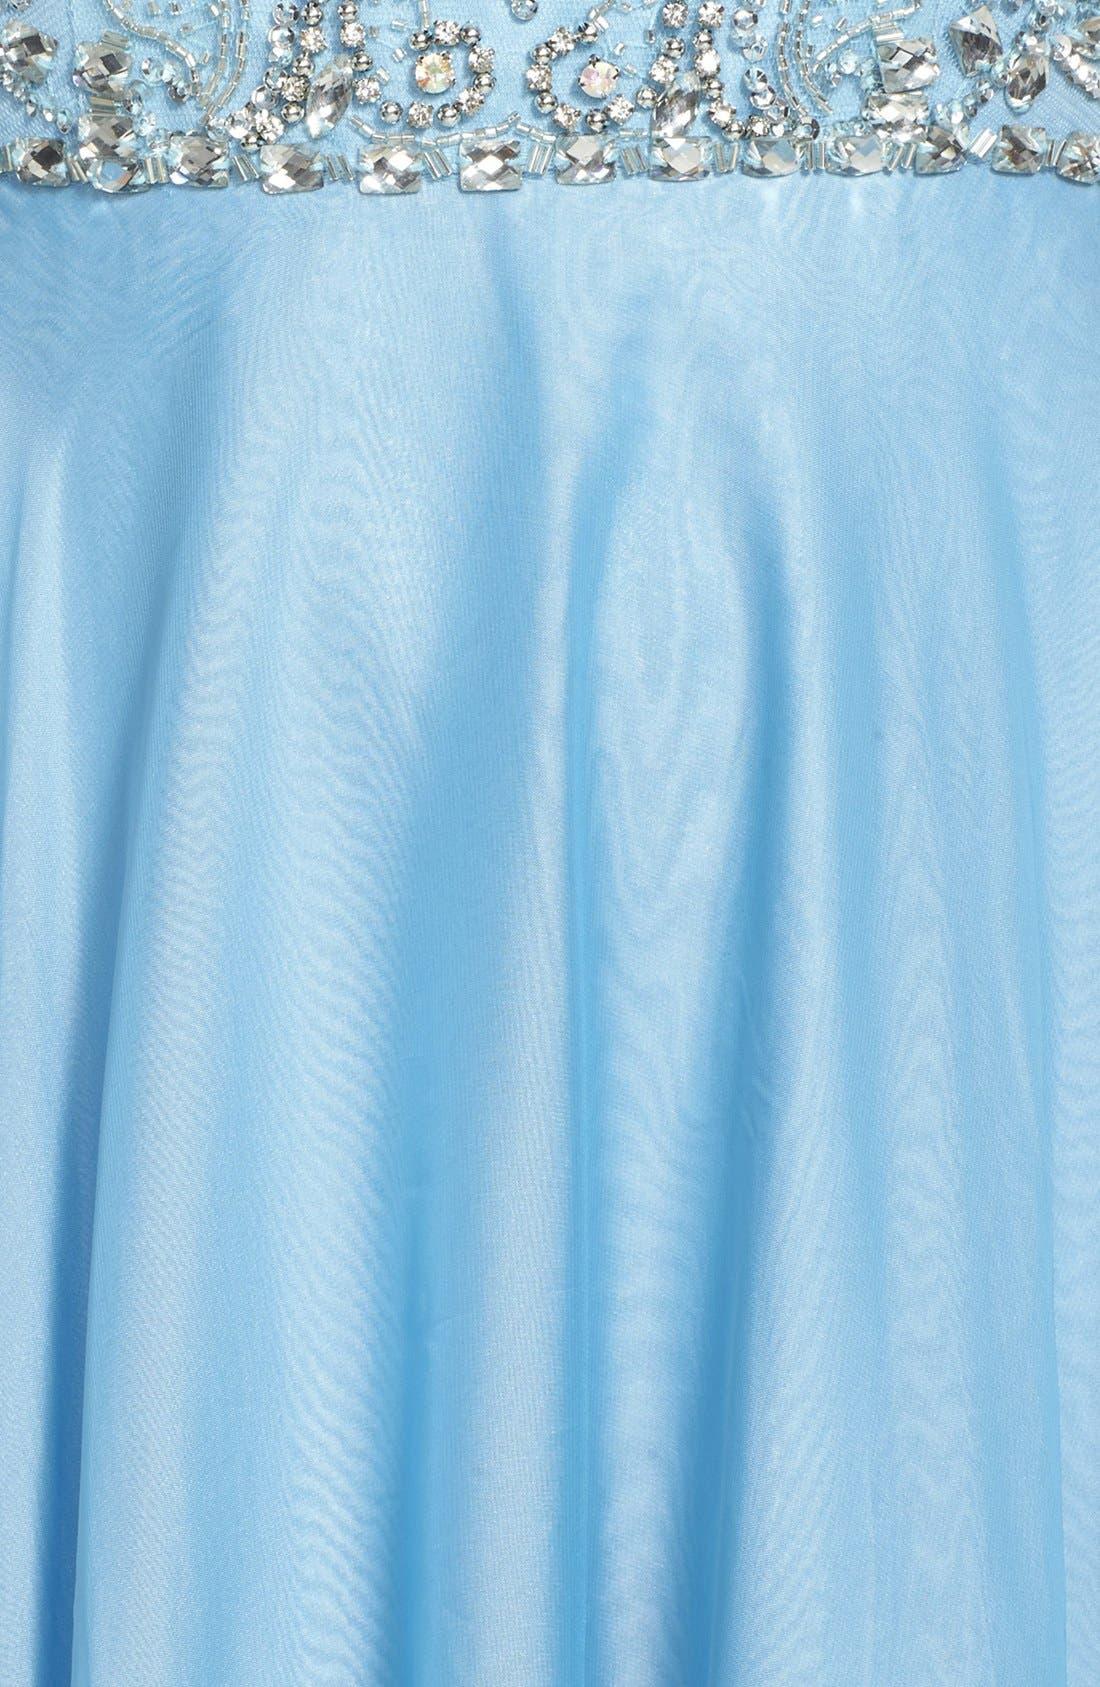 Alternate Image 3  - Sherri Hill Embellished Illusion Bodice Gown